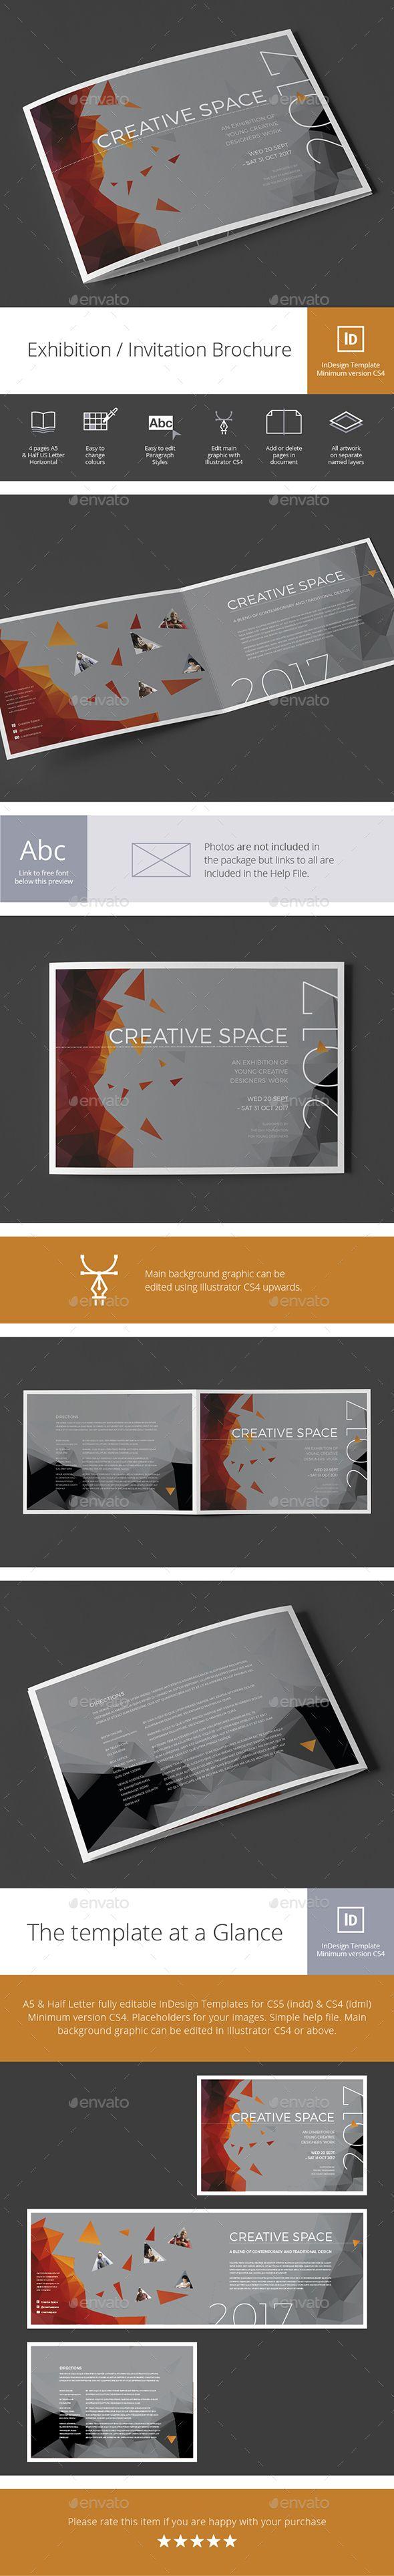 Exhibition / Invitation Brochure — InDesign INDD #graphic design #exhibition • Download ➝ https://graphicriver.net/item/exhibition-invitation-brochure/19499091?ref=pxcr